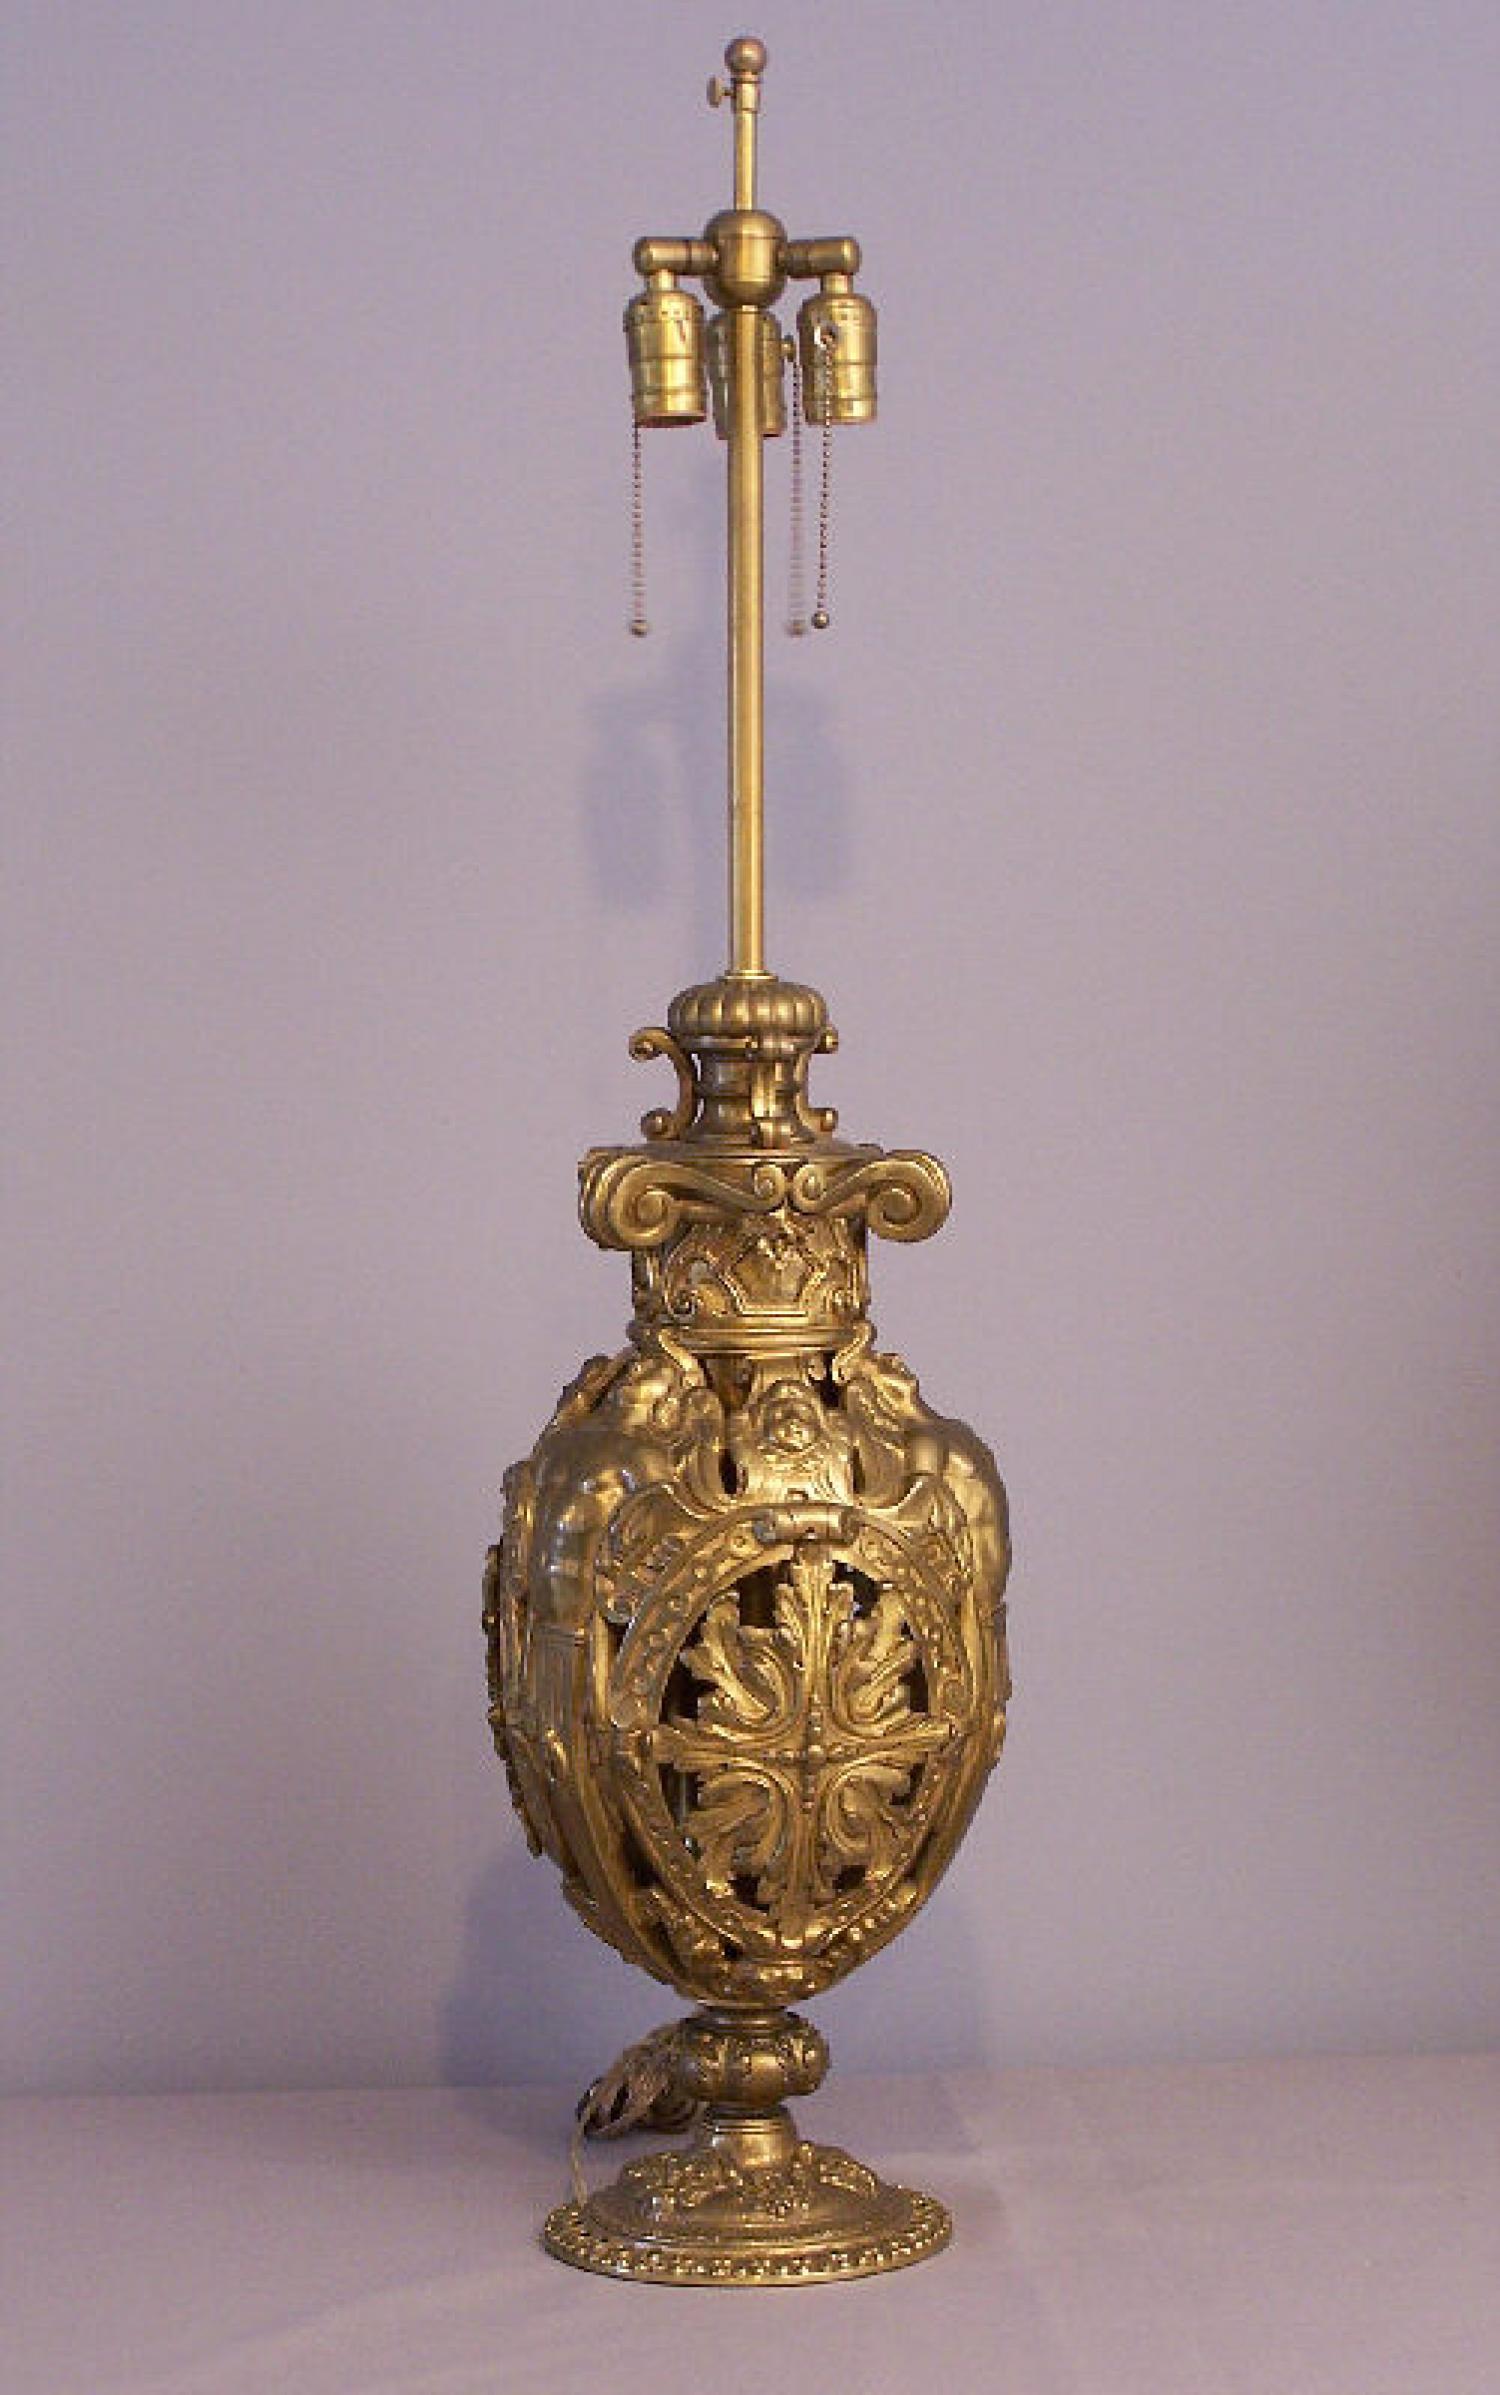 American Renaissance Revival cherub oil lamp 1880